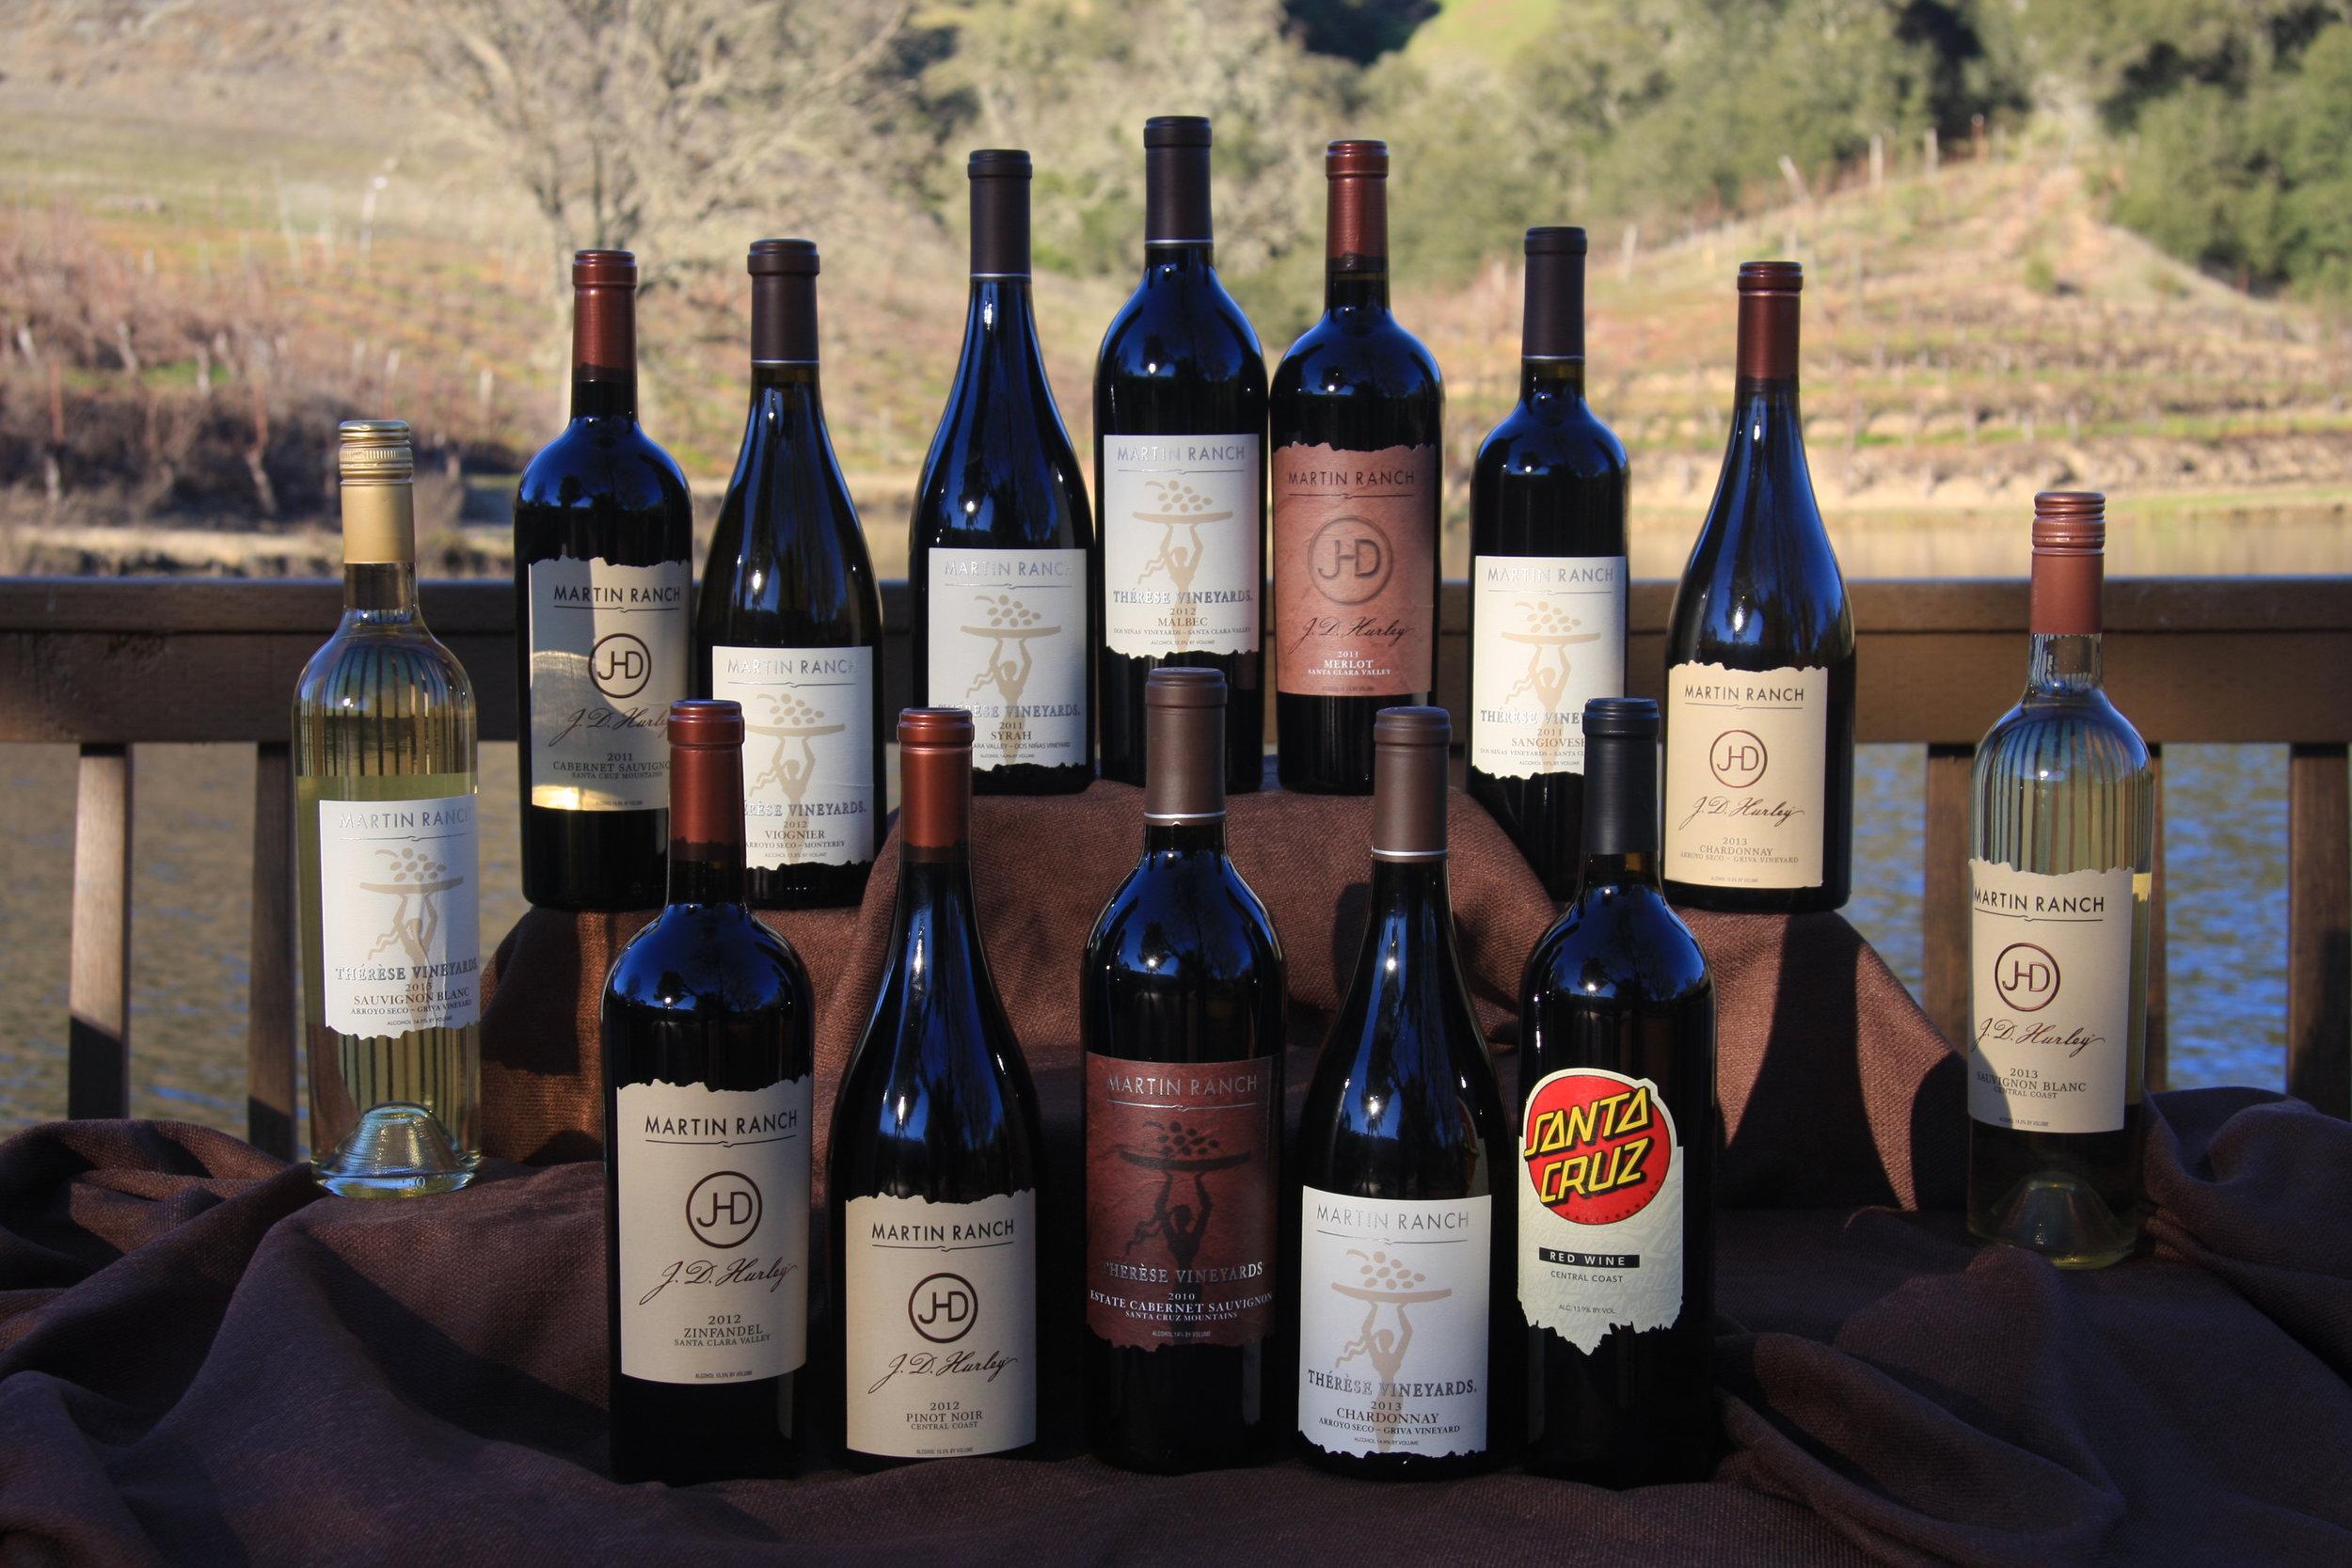 SF chronicle award wines 019.JPG